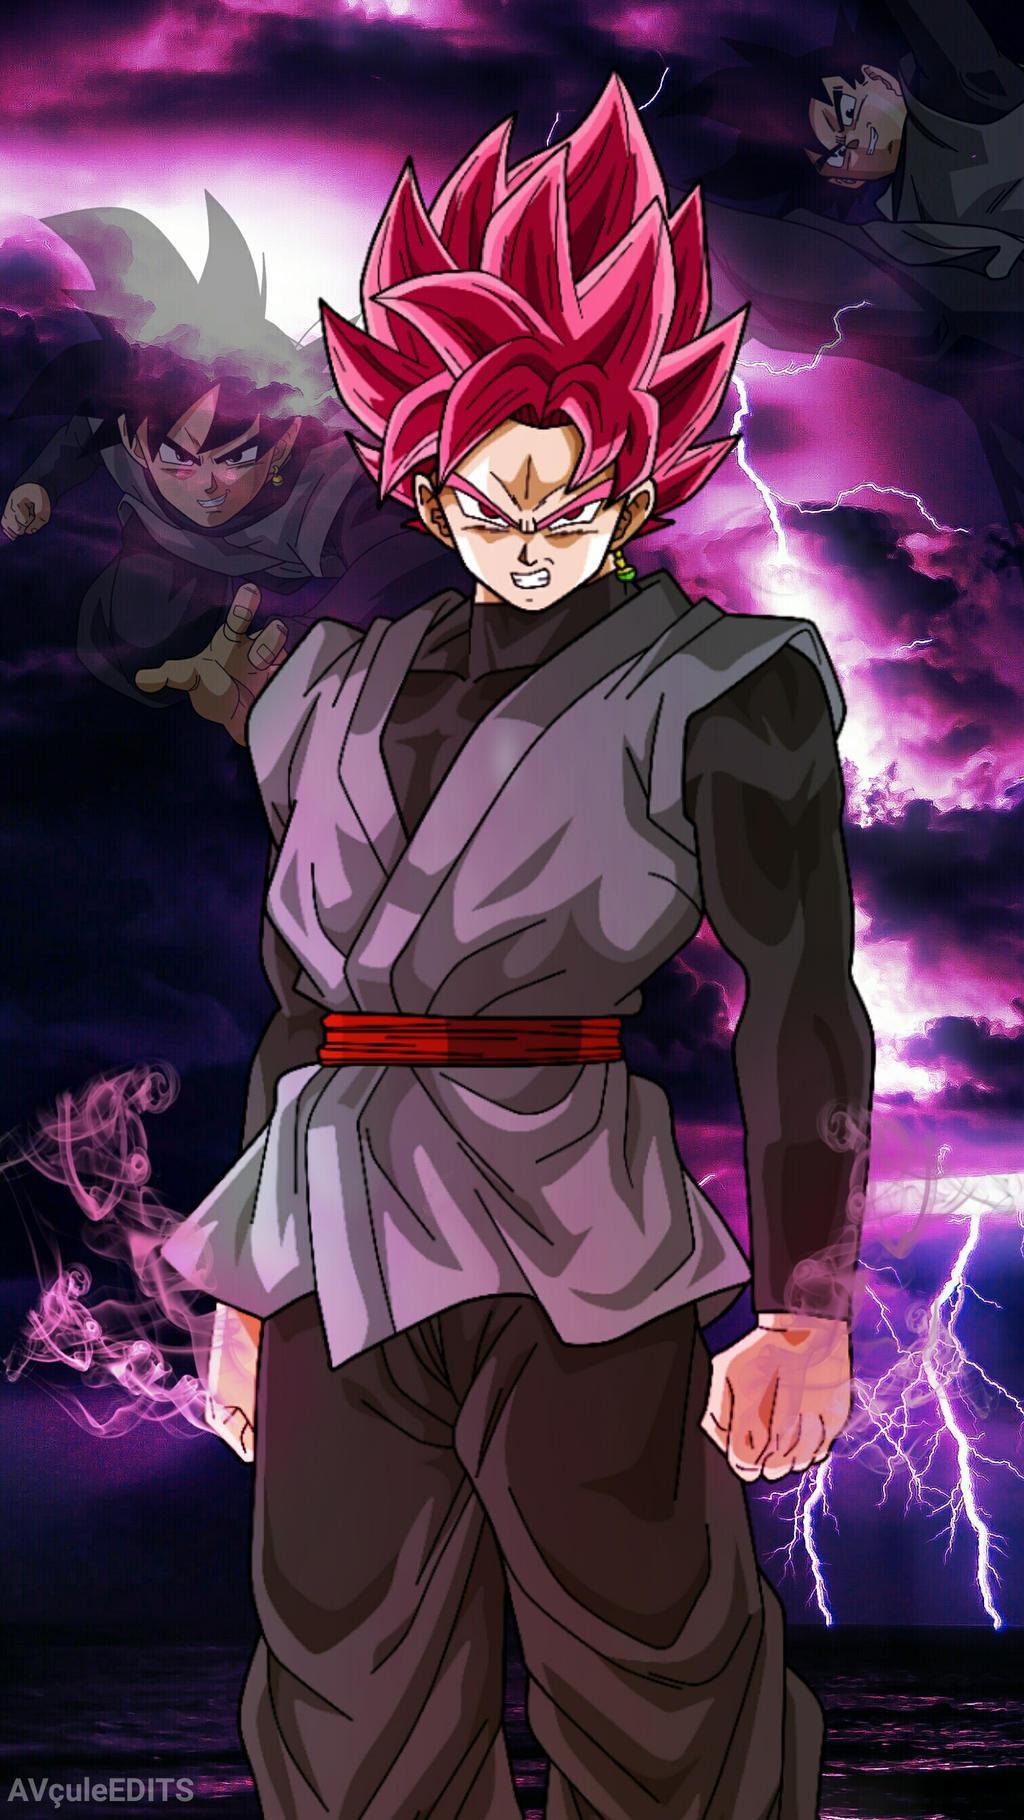 SnapBackKid23 | DeviantArt  |Black Goku Super Saiyan